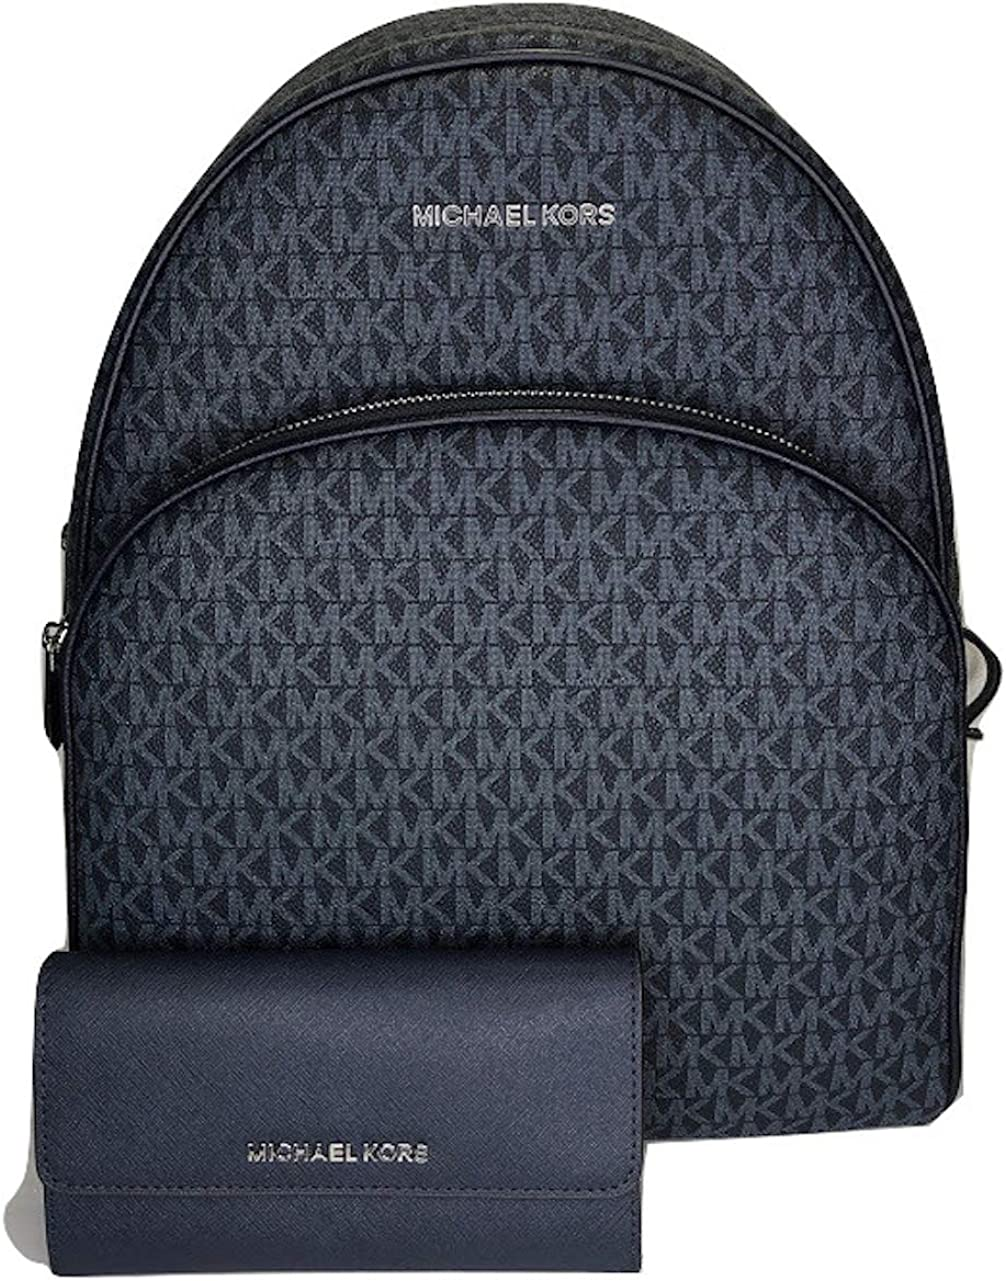 MICHAEL Michael Kors Abbey Large Backpack bundled with Michael Kors Jet Set Travel Trifold Wallet (Signature MK Admiral)